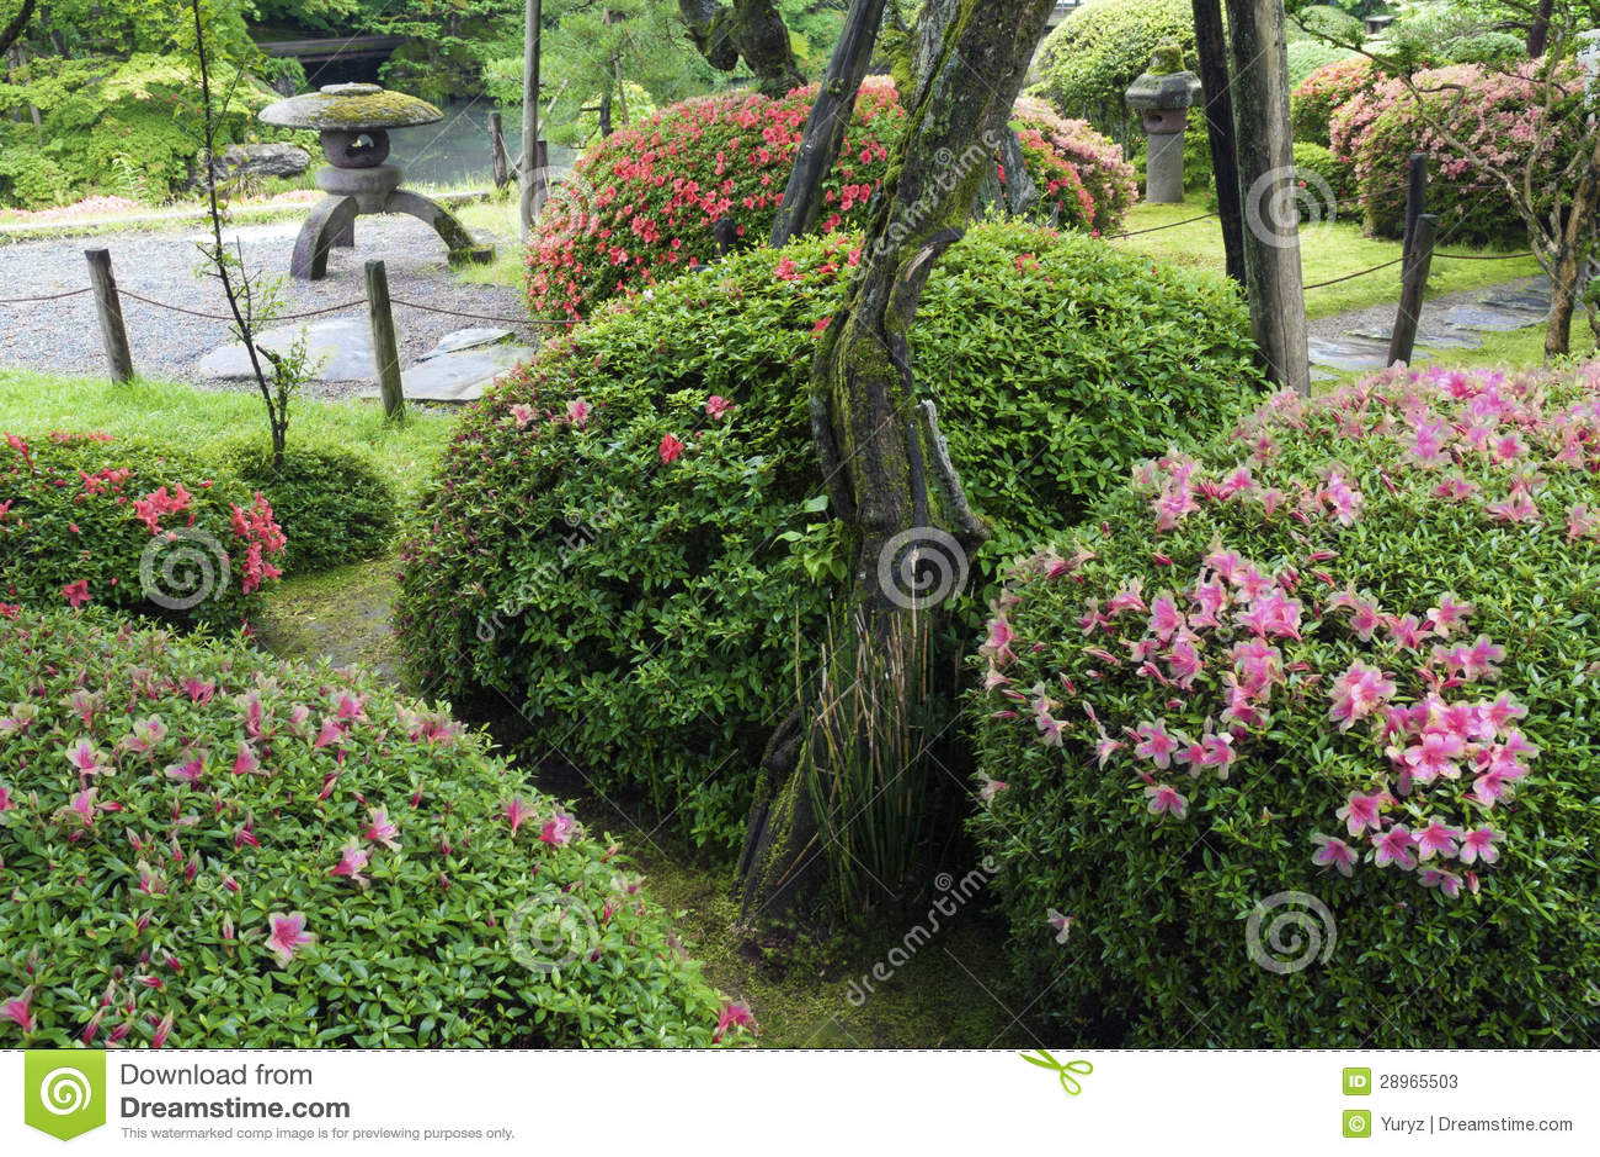 zen garden summer - photo #7